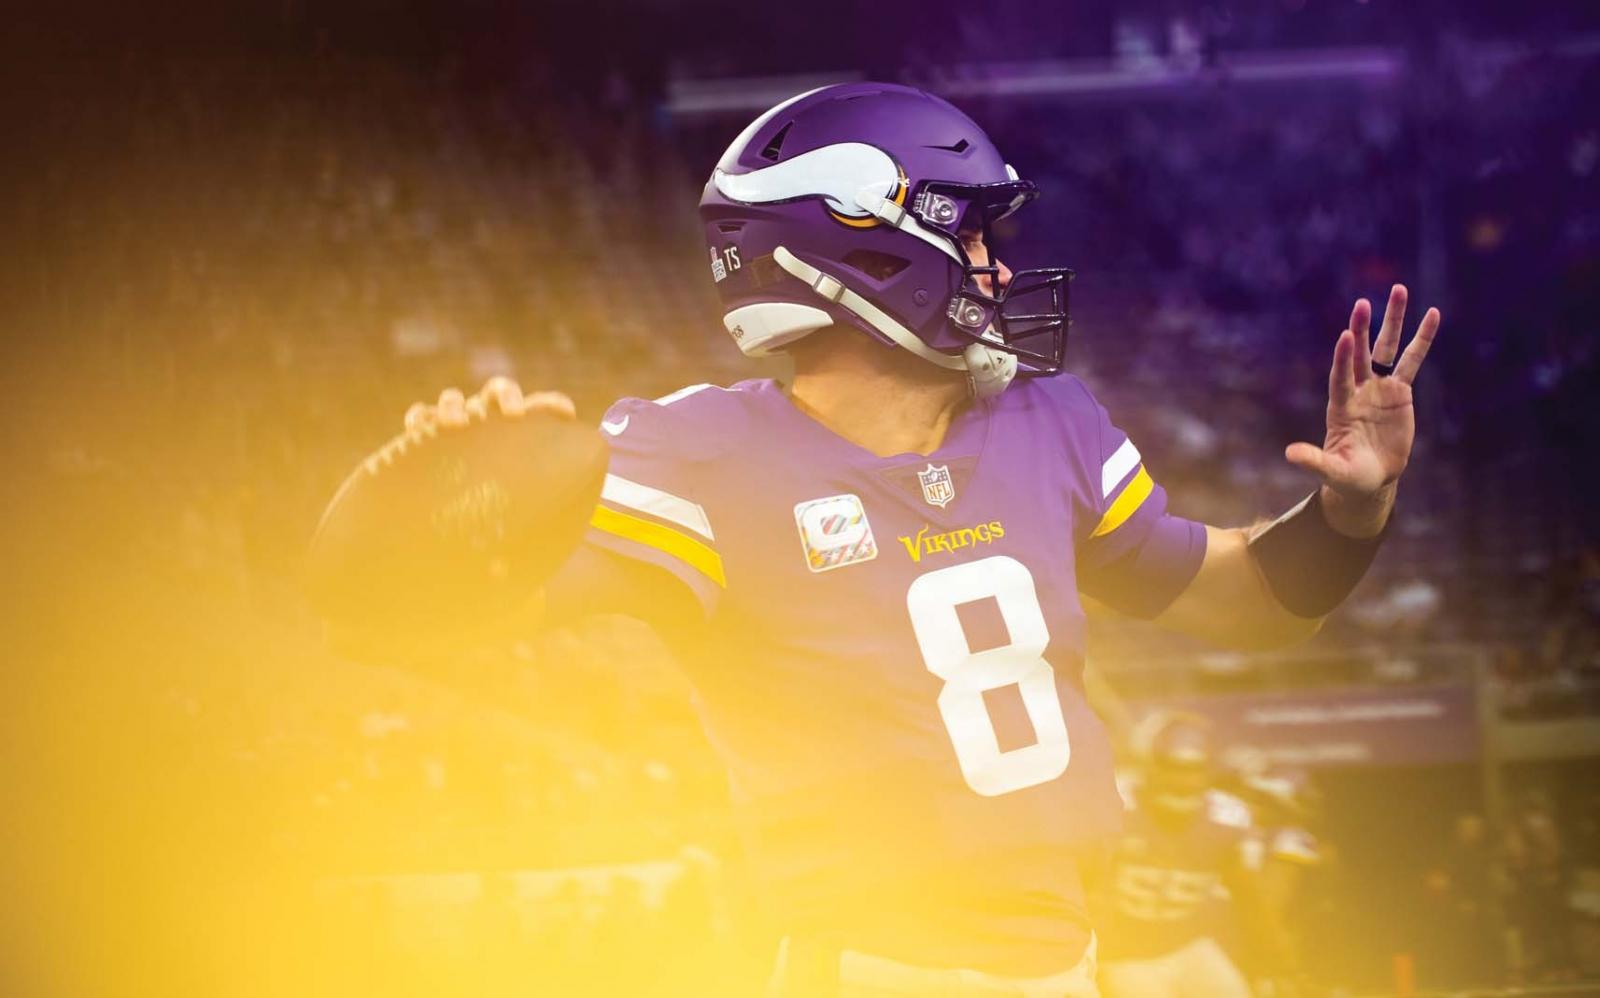 Kirk Cousins of the Minnesota Vikings.